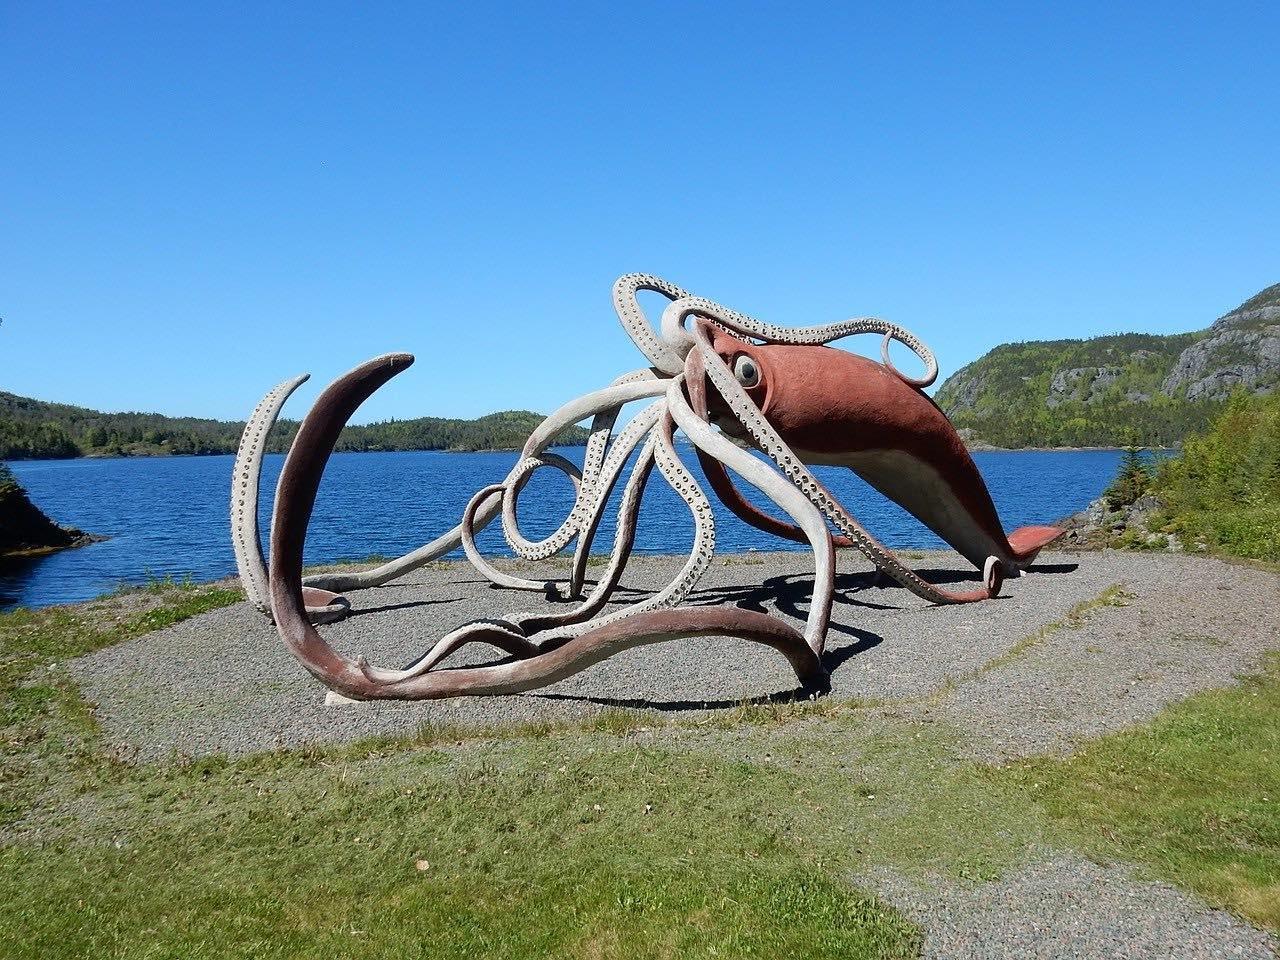 Squid Sculpture_Giant Squid Roadside Art_Newfoundland Canada_PD